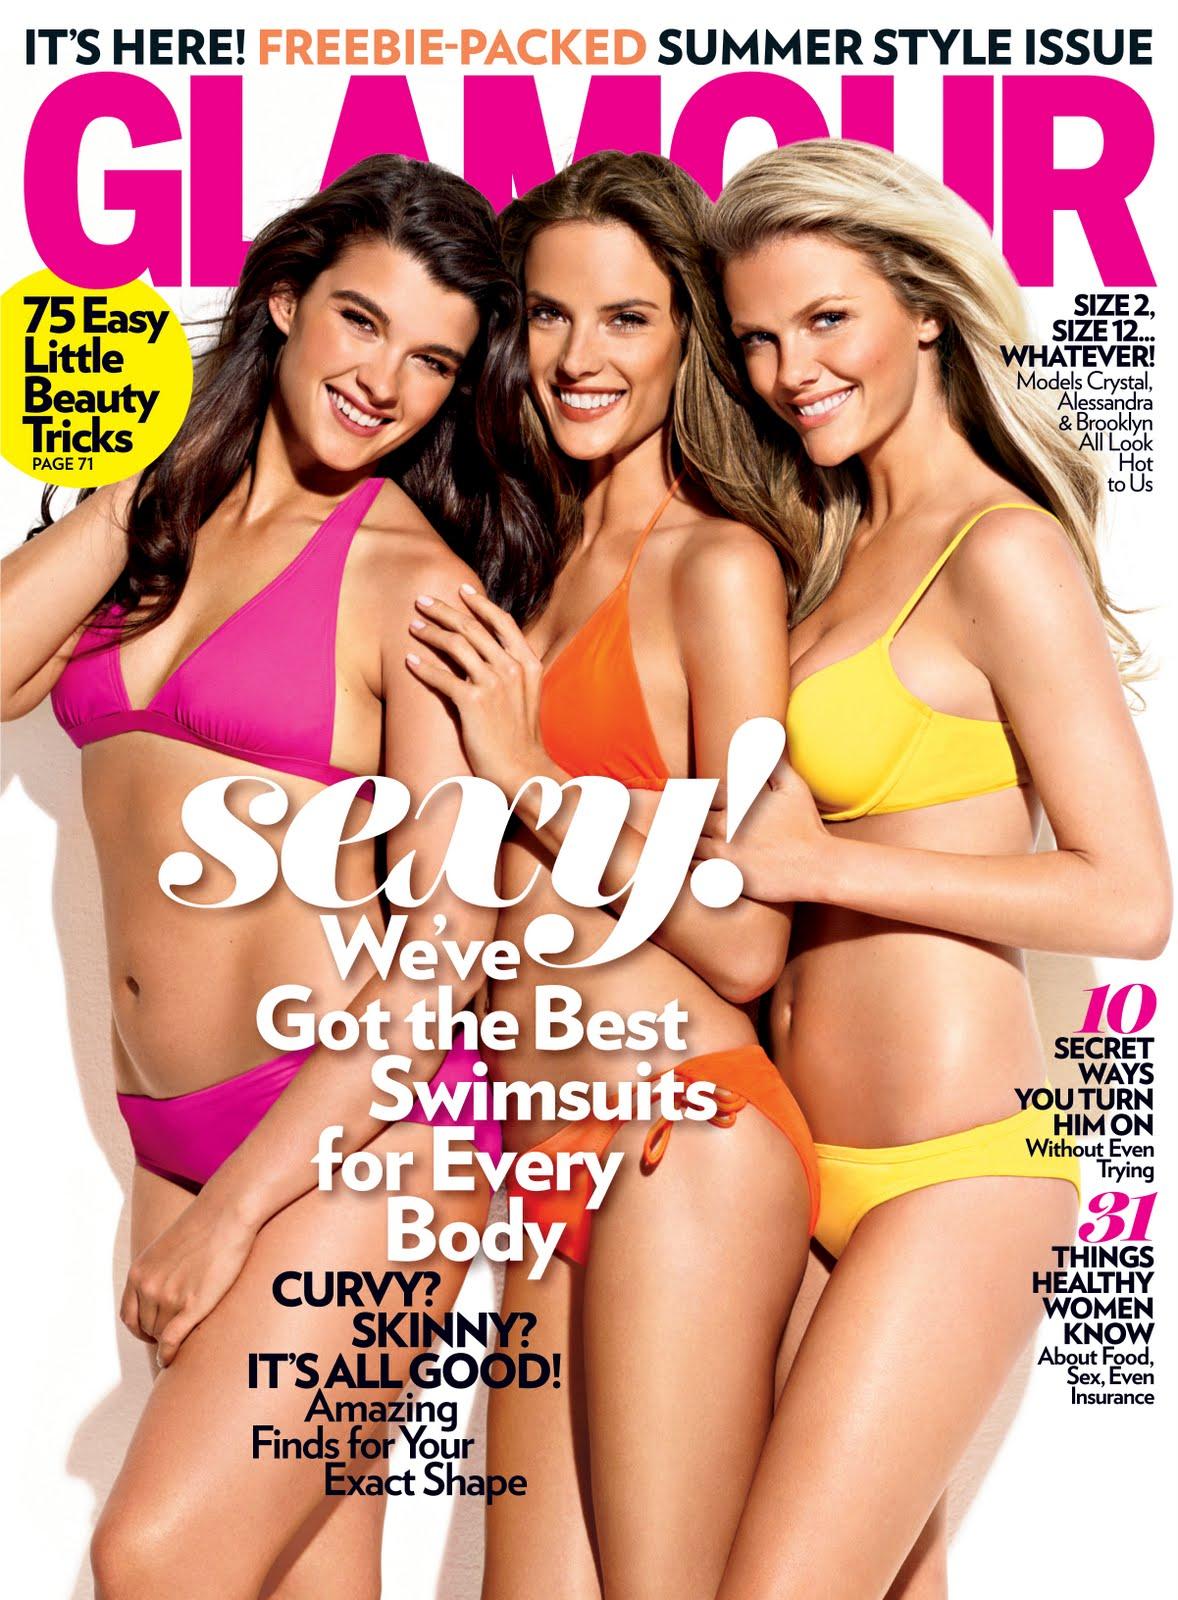 http://3.bp.blogspot.com/_mf2NYHWGS3s/S-k947OwbxI/AAAAAAAAI28/3Mft7VMGbSA/s1600/Every+Body+Is+A+Hot+Body+by+Matthias+Vriens-McGrath+(Glamour+US+June+2010).jpg